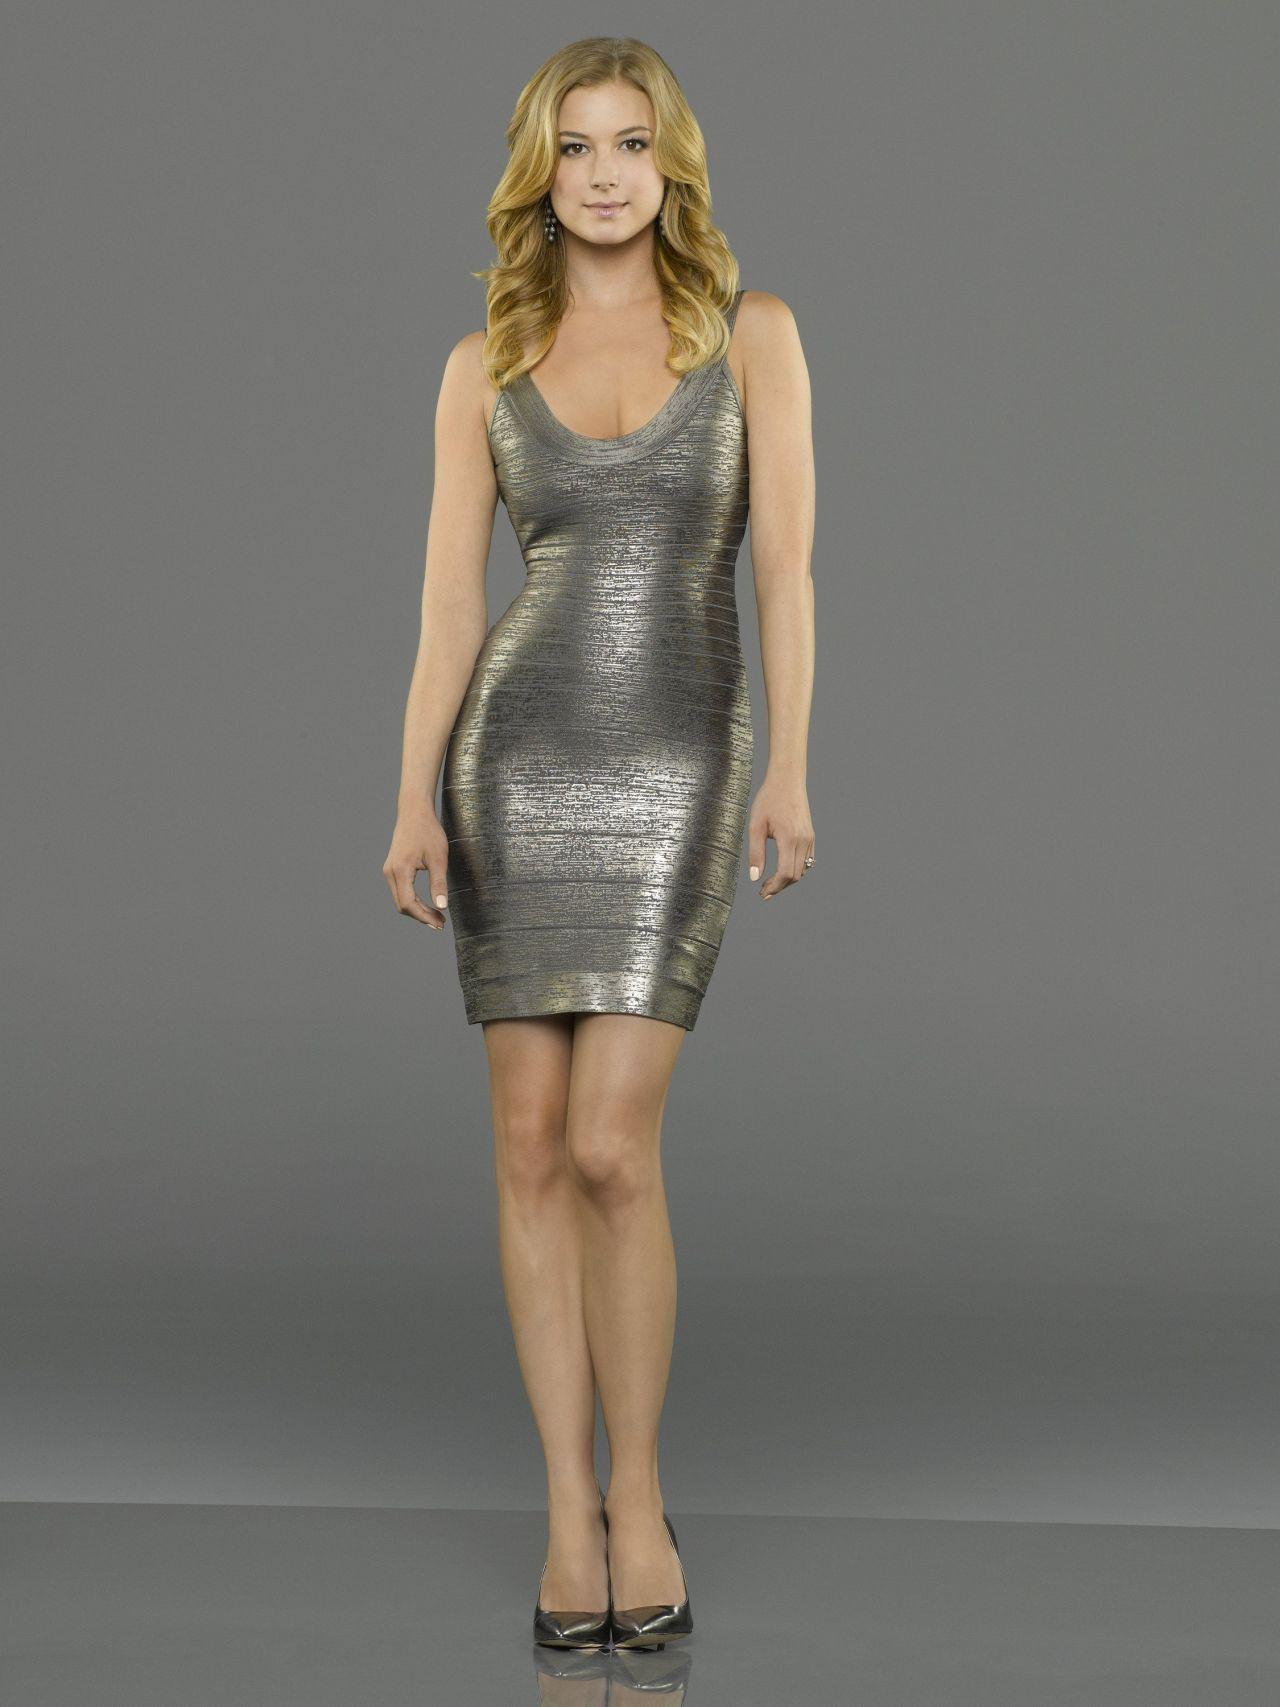 Emily VanCamp  Revenge TV Series Season 3 Promoshoot